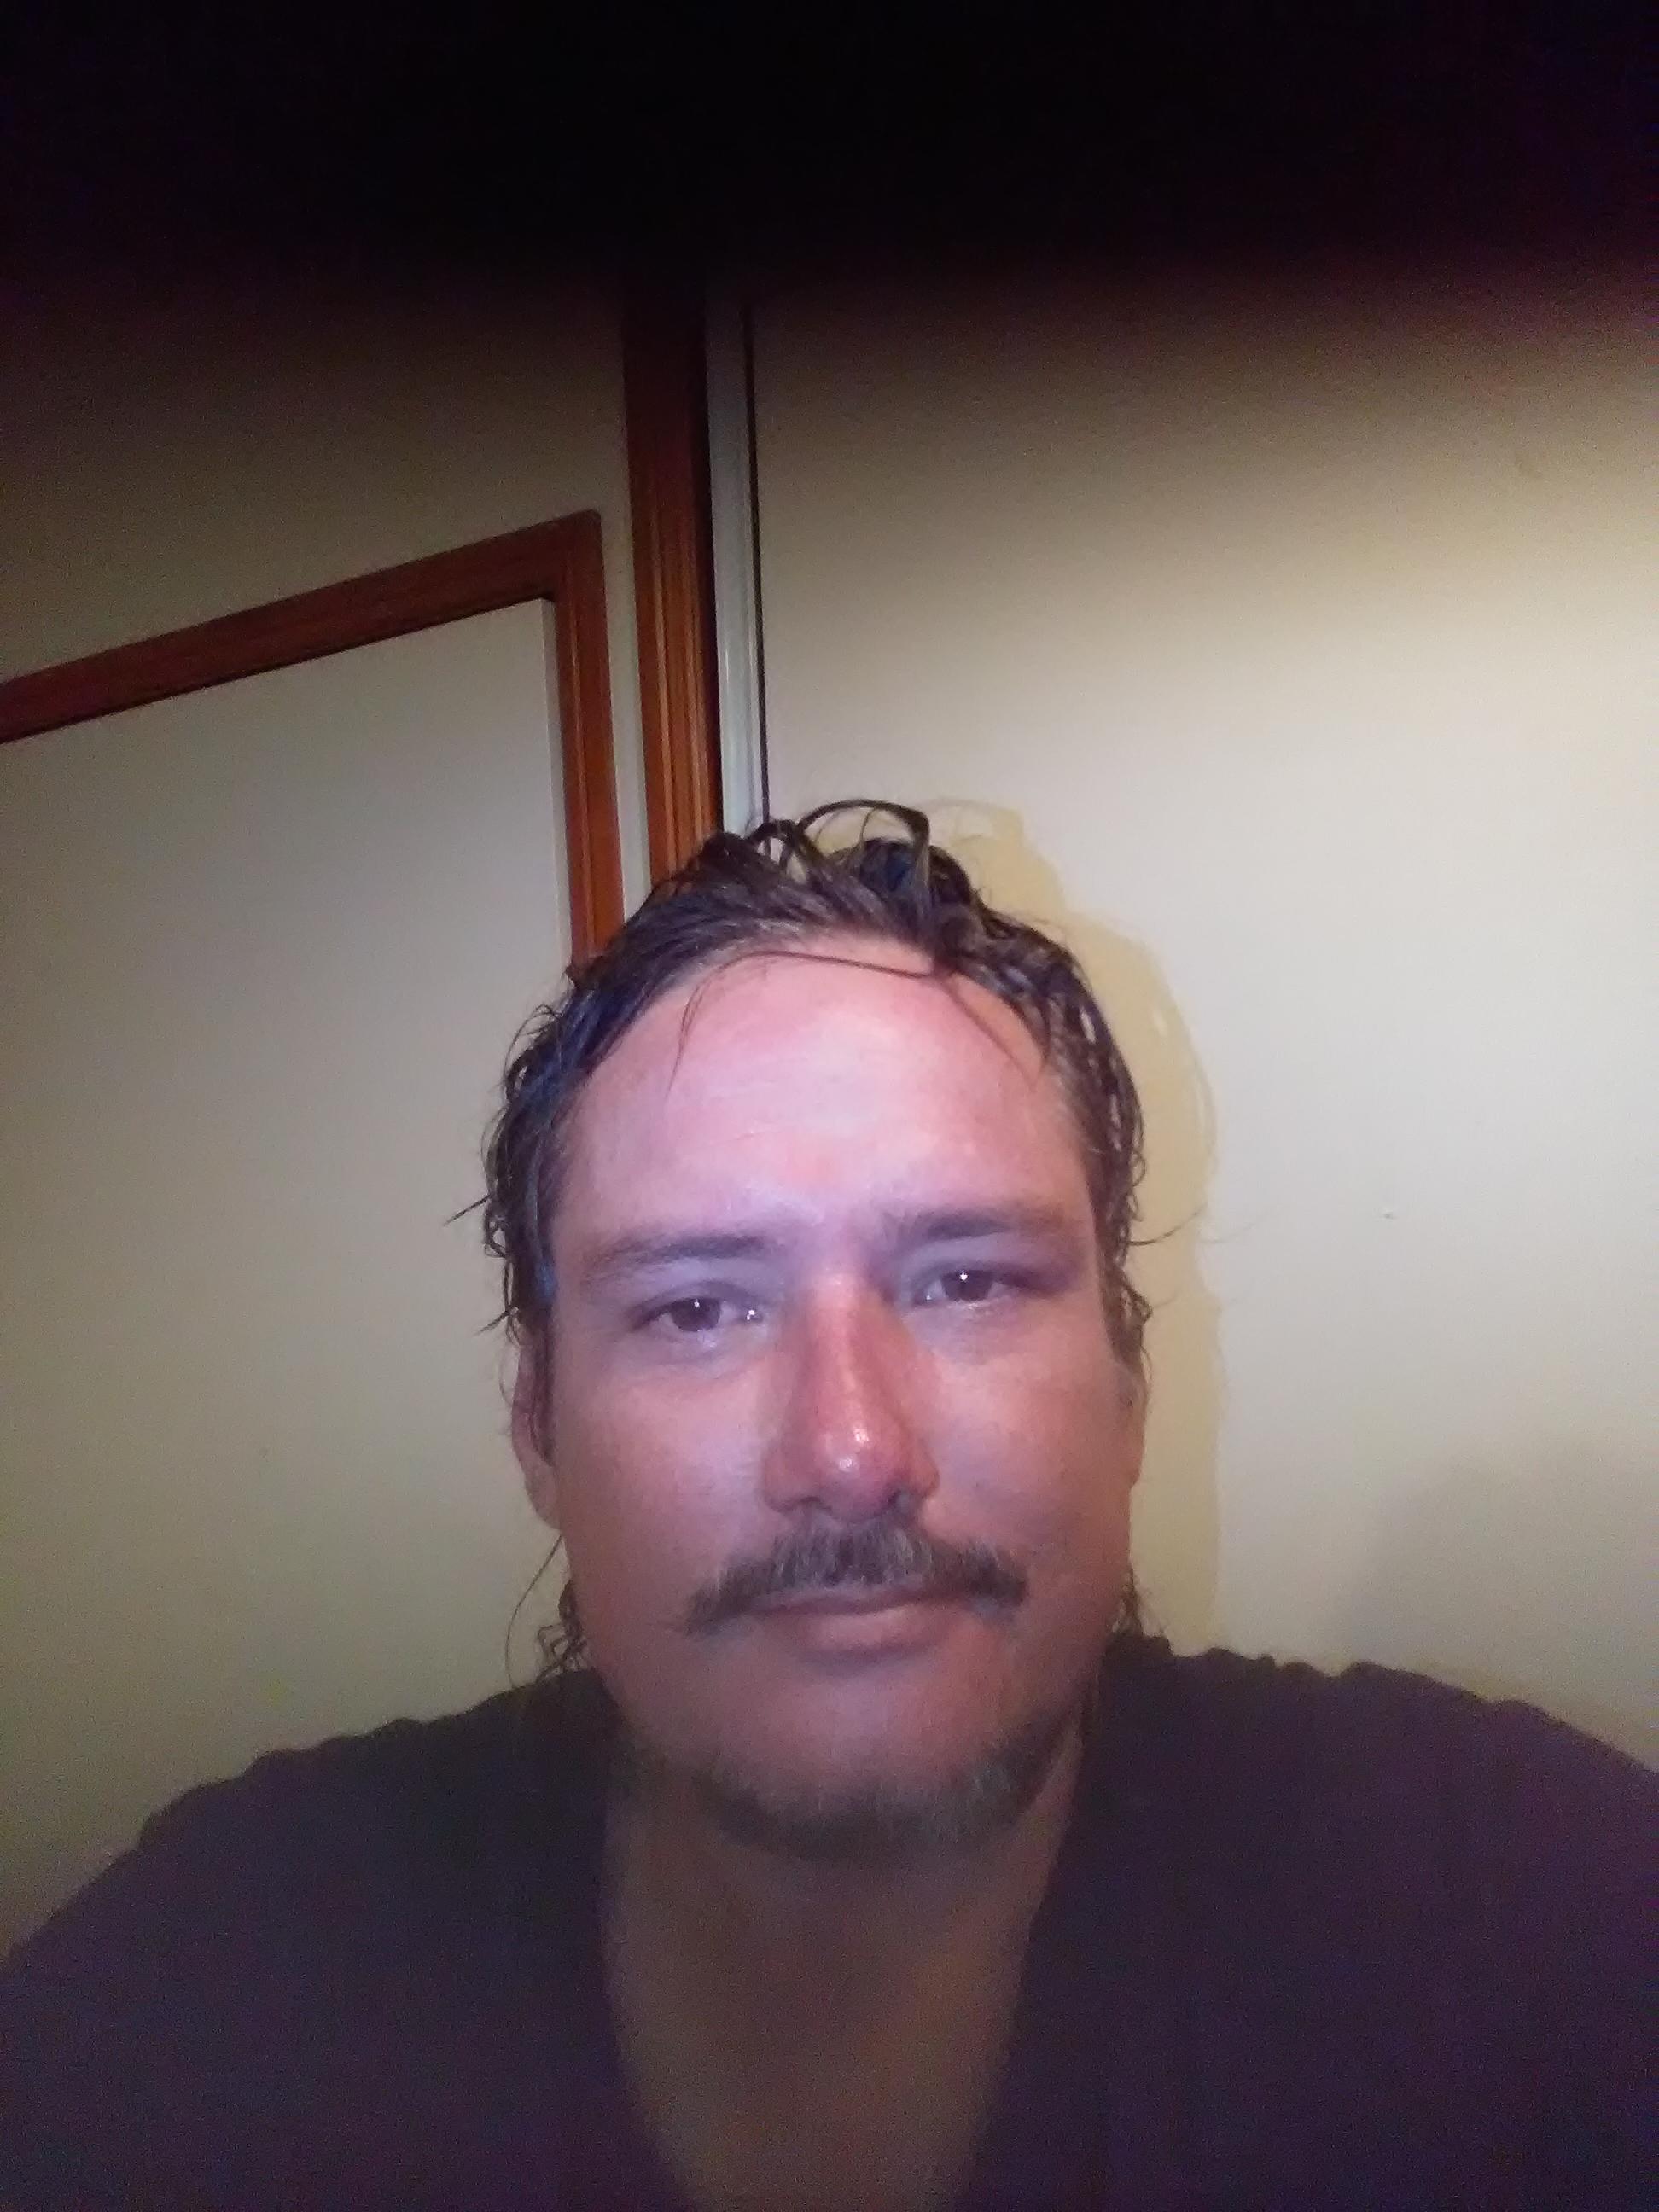 dating site Mackay dating 14 vuotta ikäeroa